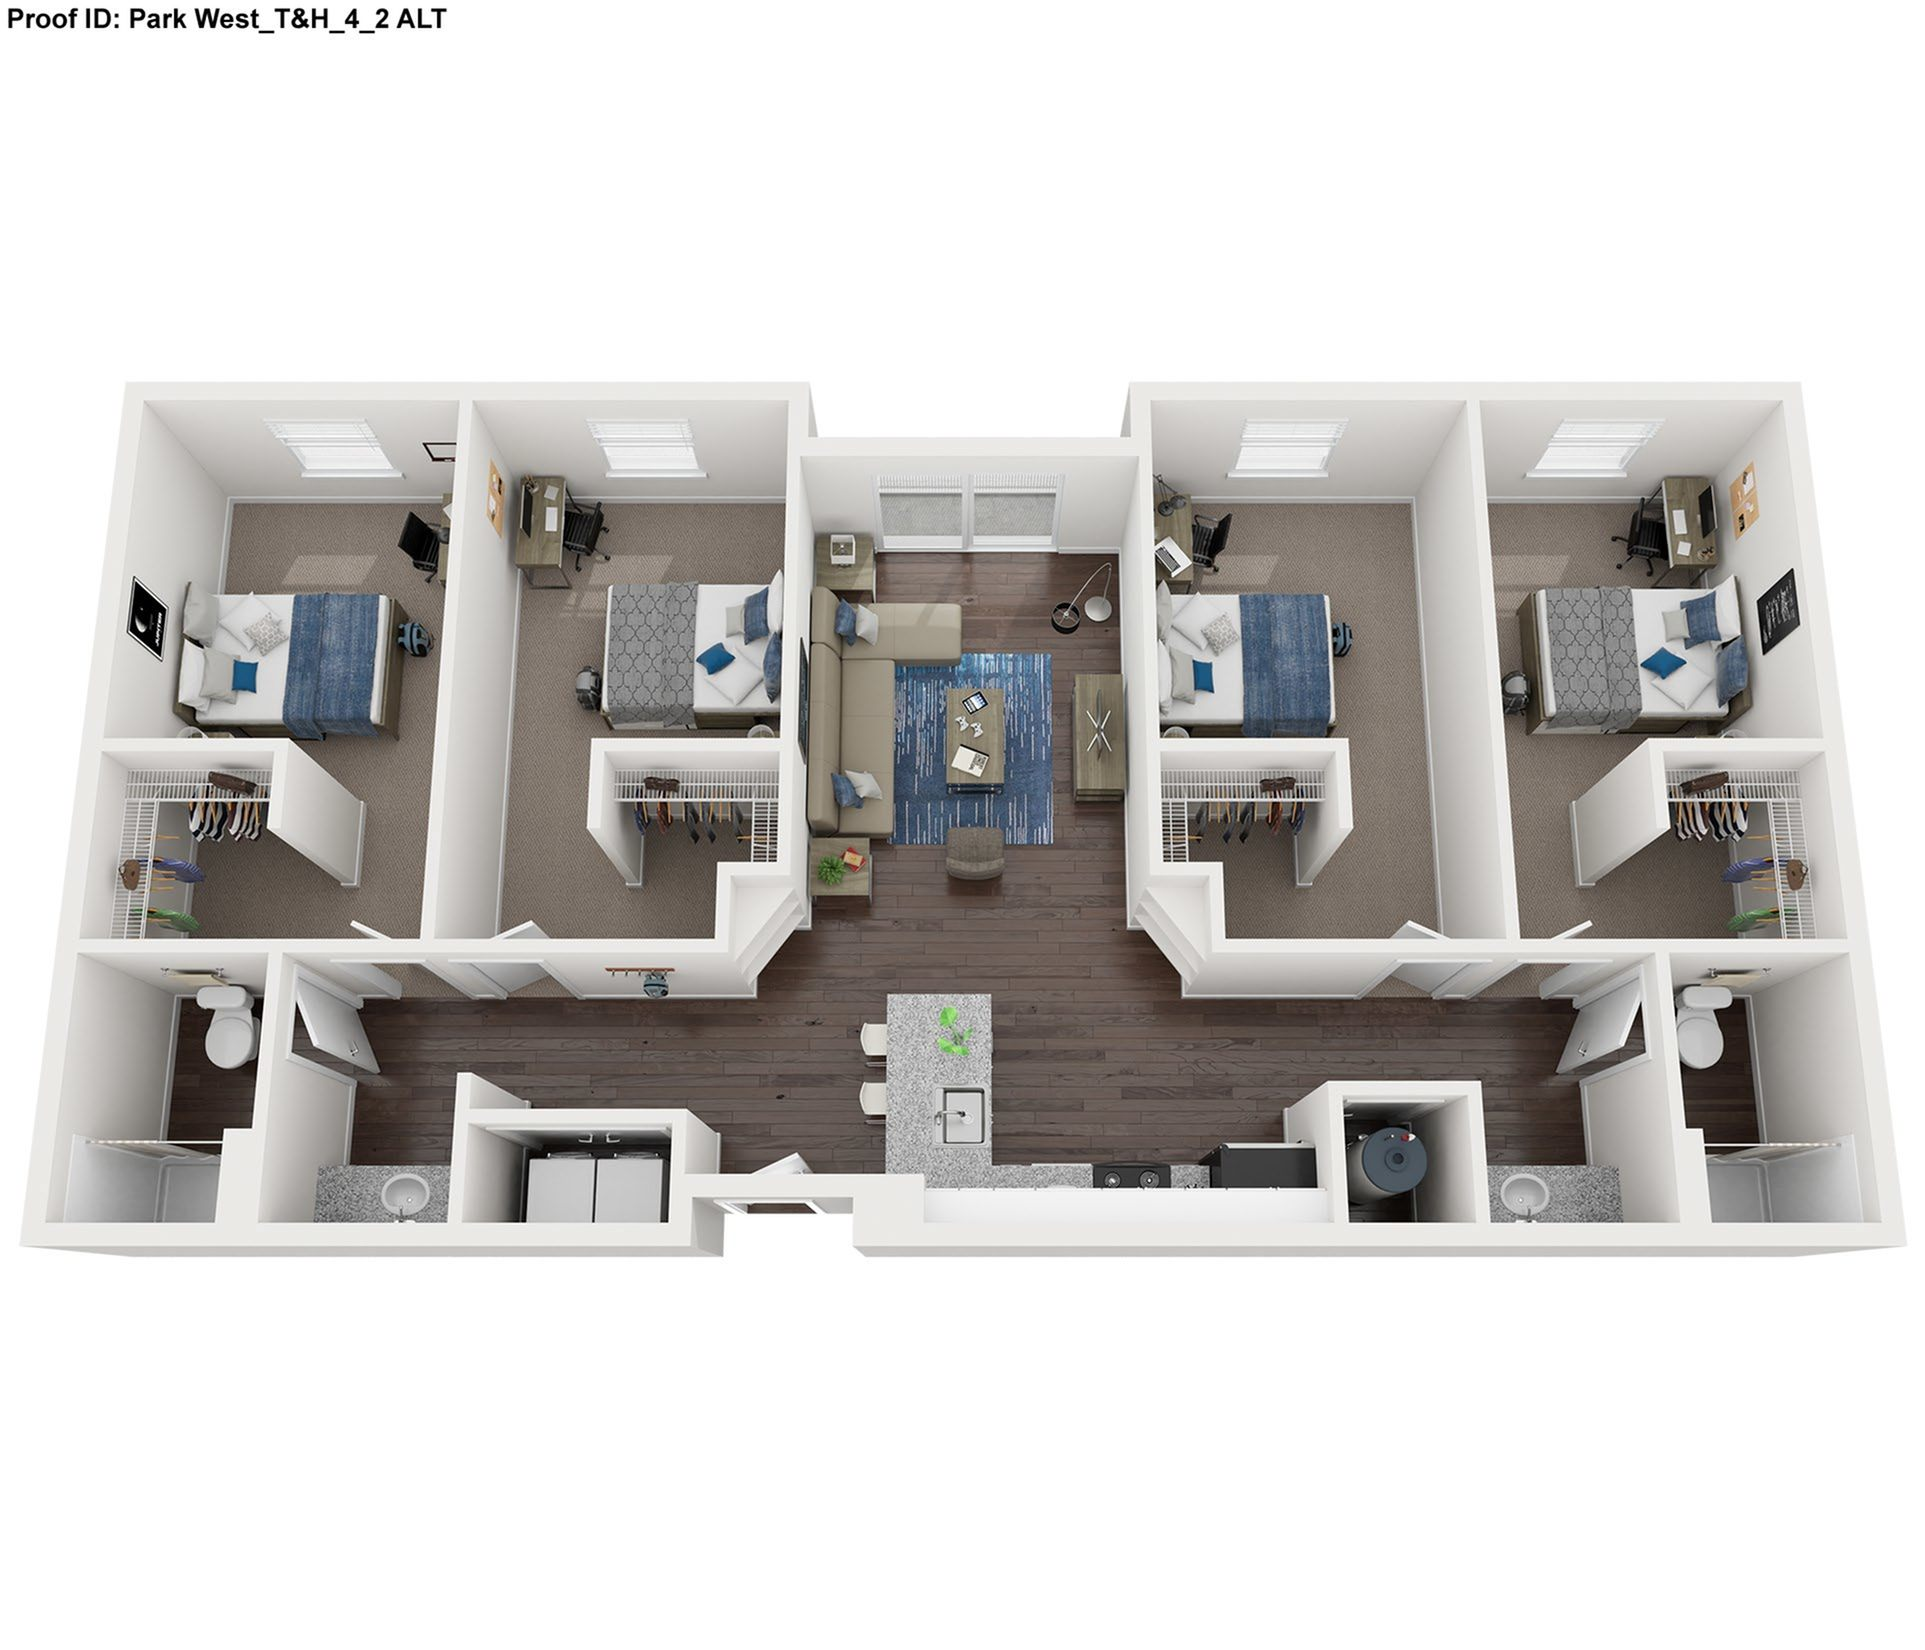 4 Bedroom 2 Bathroom Floor Plan